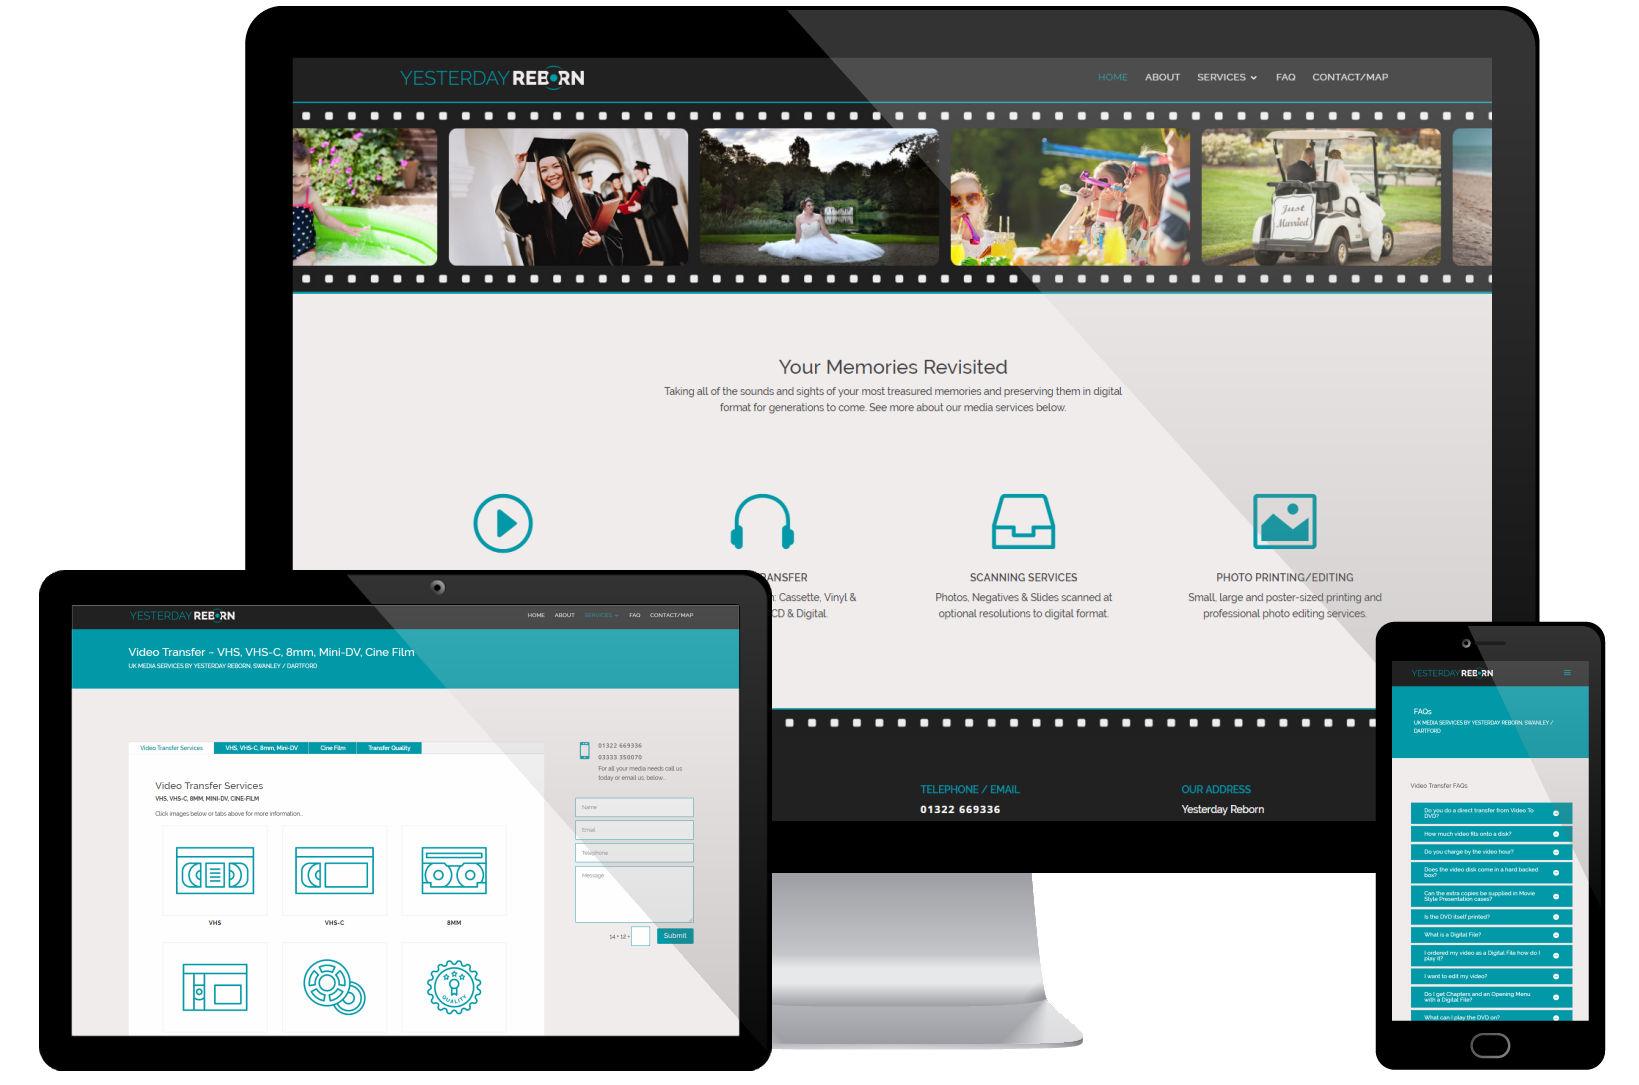 Website Screenshot - Yesterday Reborn